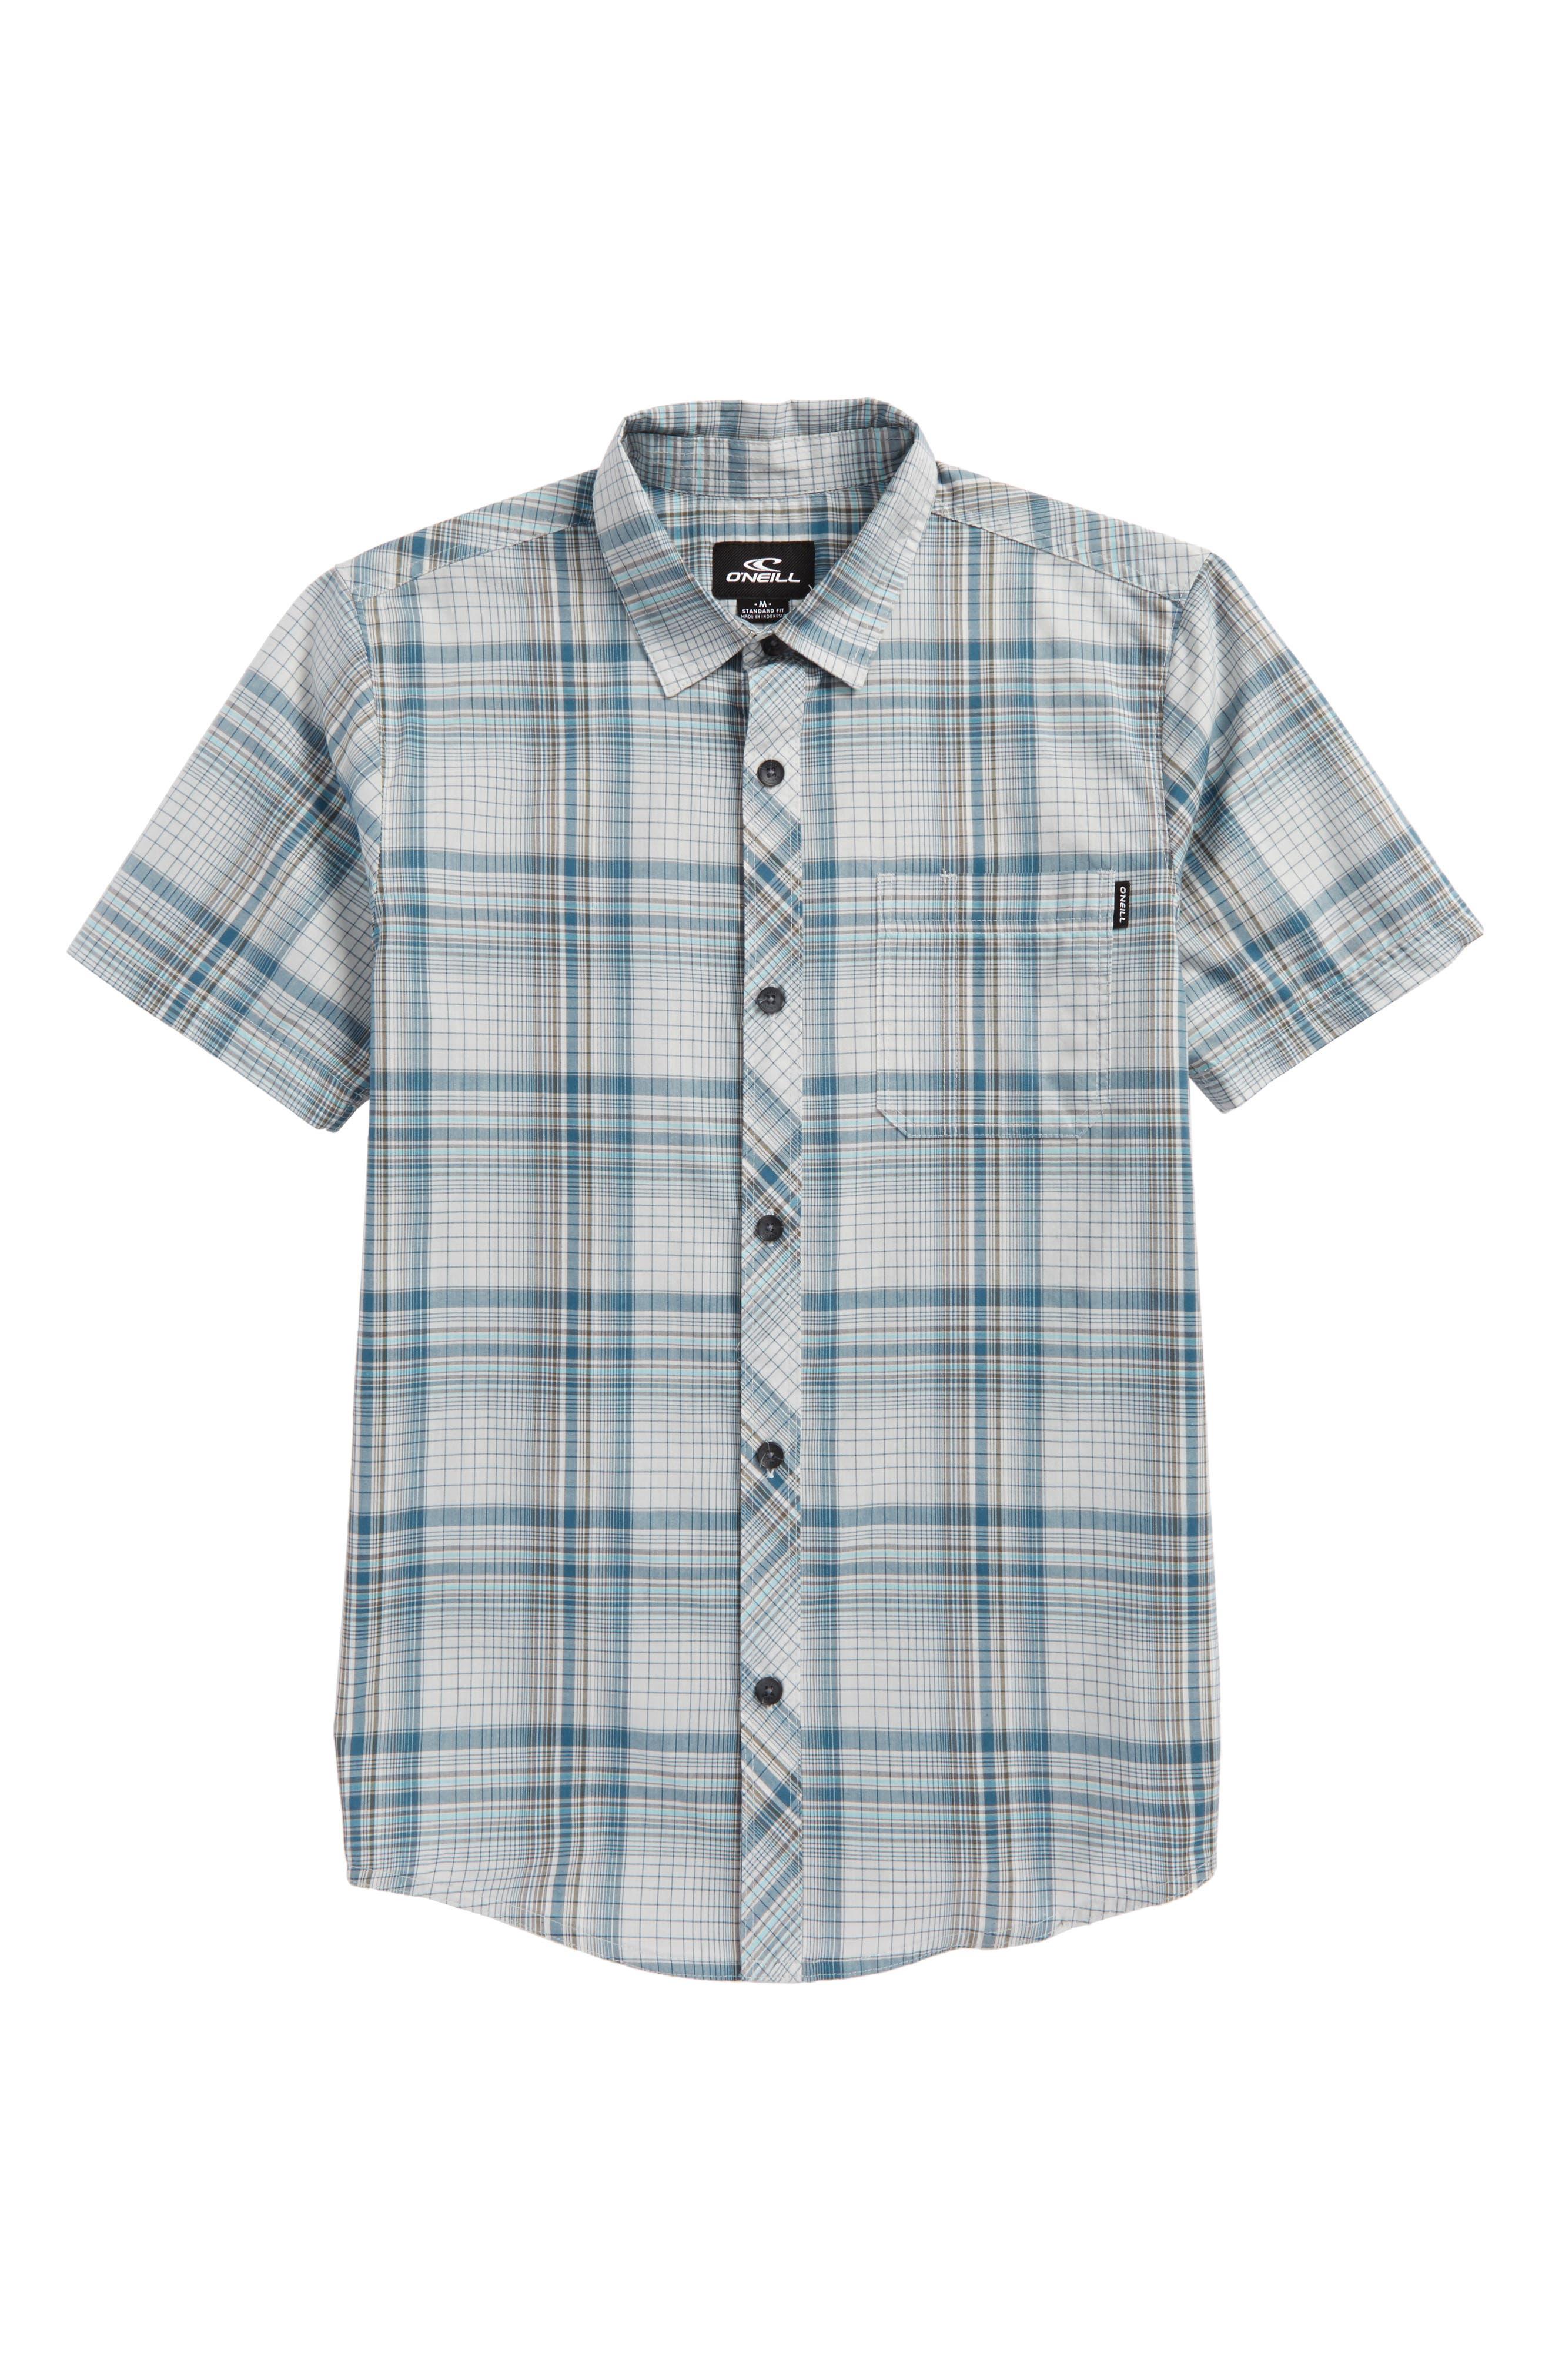 Sturghill Plaid Woven Shirt,                             Main thumbnail 1, color,